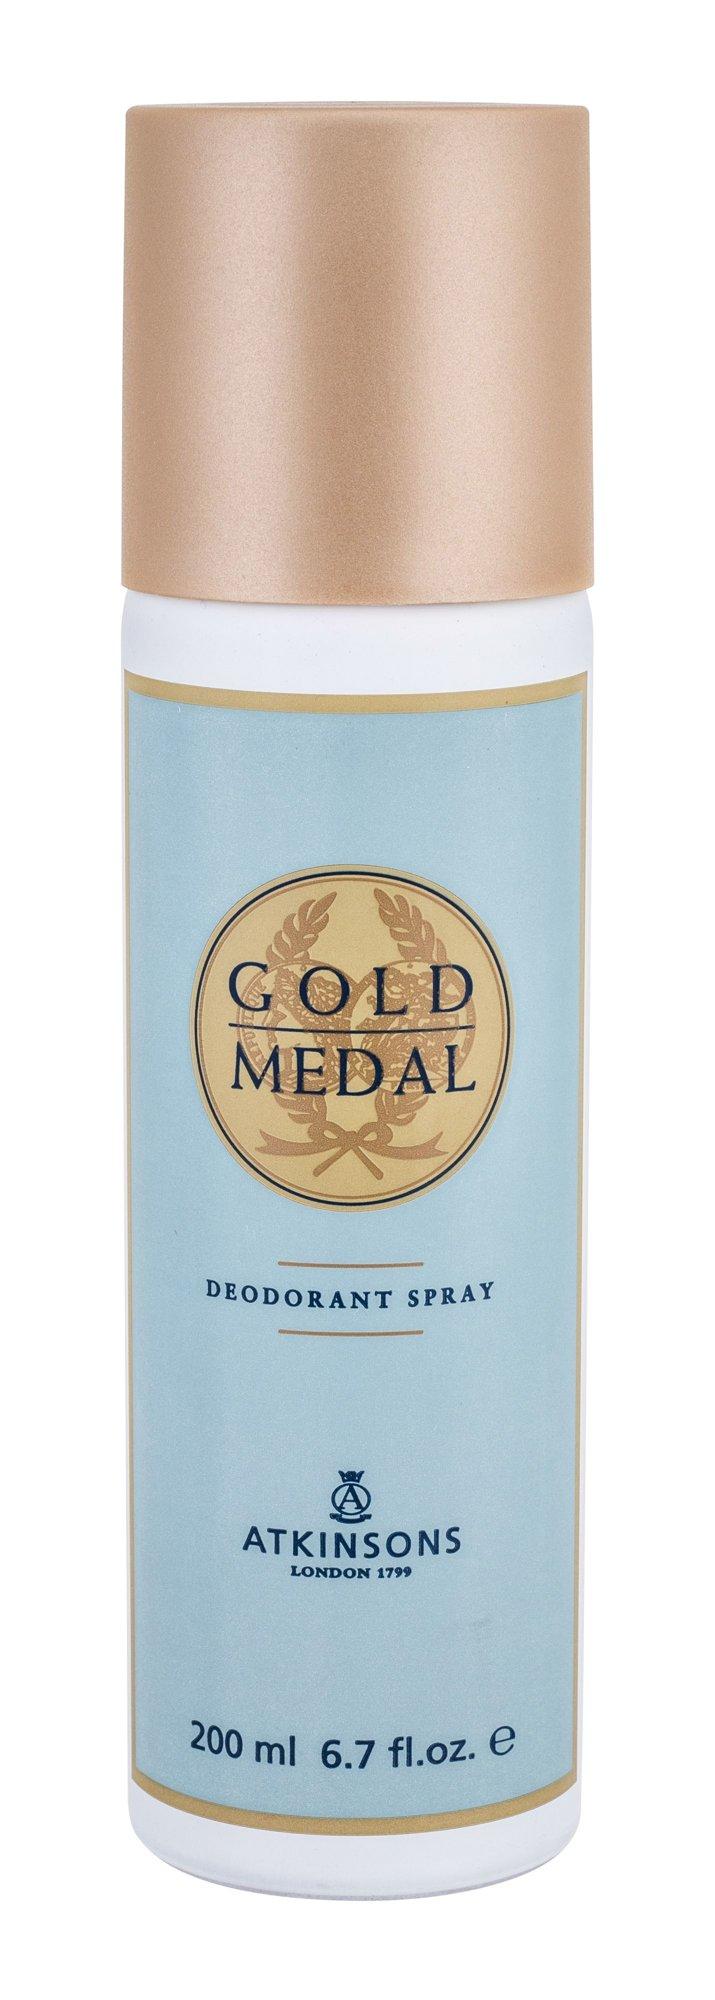 Atkinsons Gold Medal Deodorant 200ml